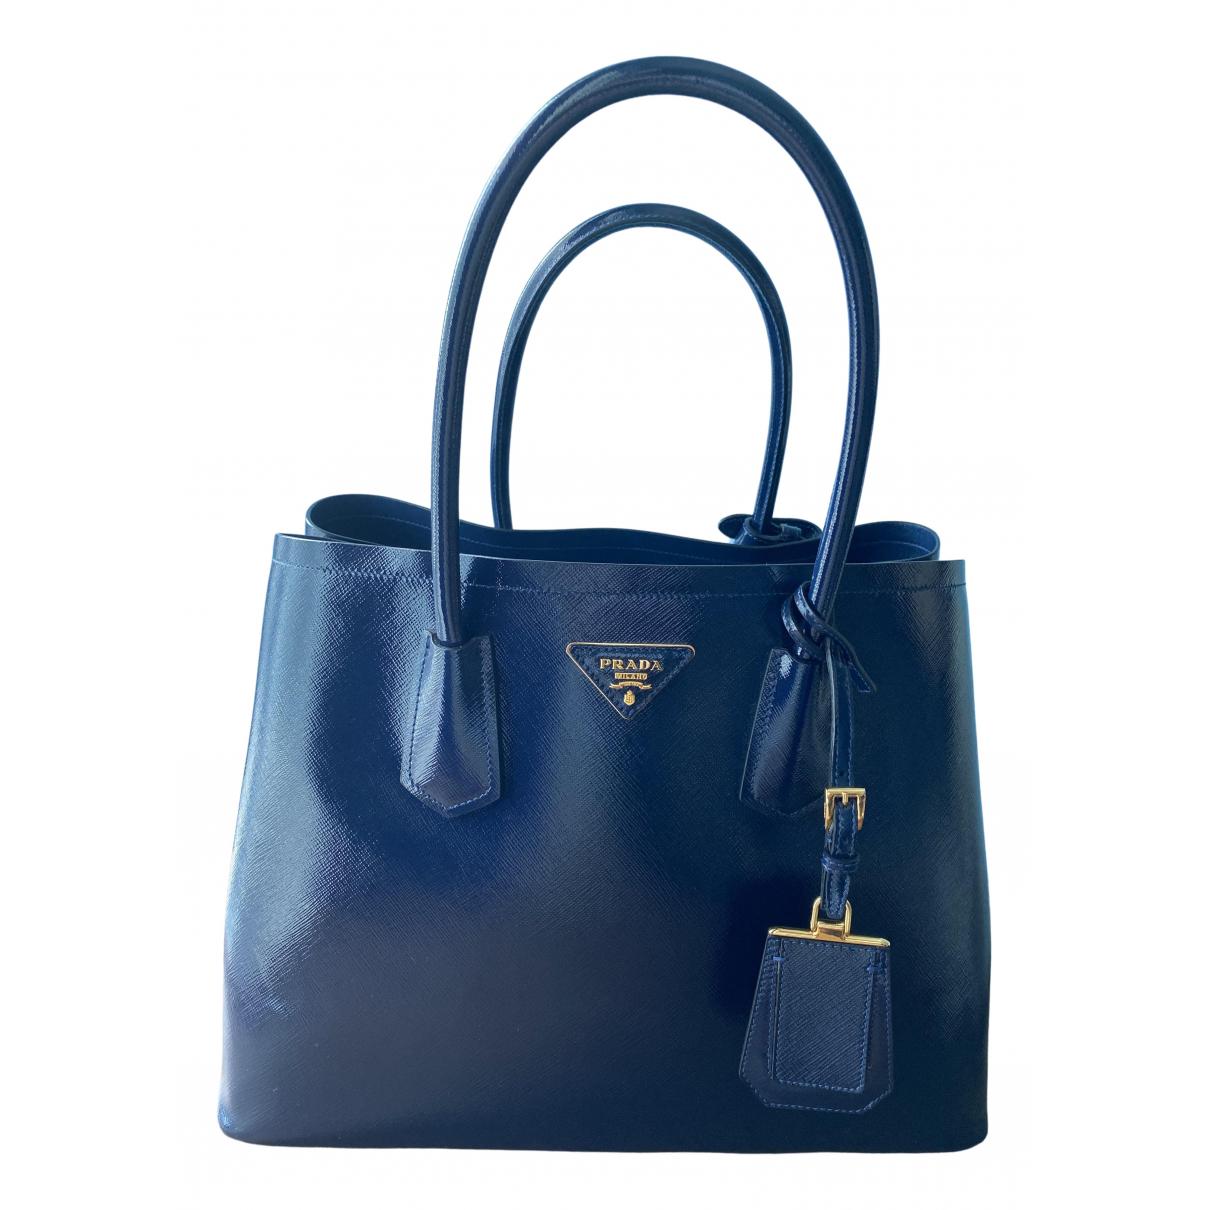 Prada saffiano  Navy Patent leather handbag for Women \N